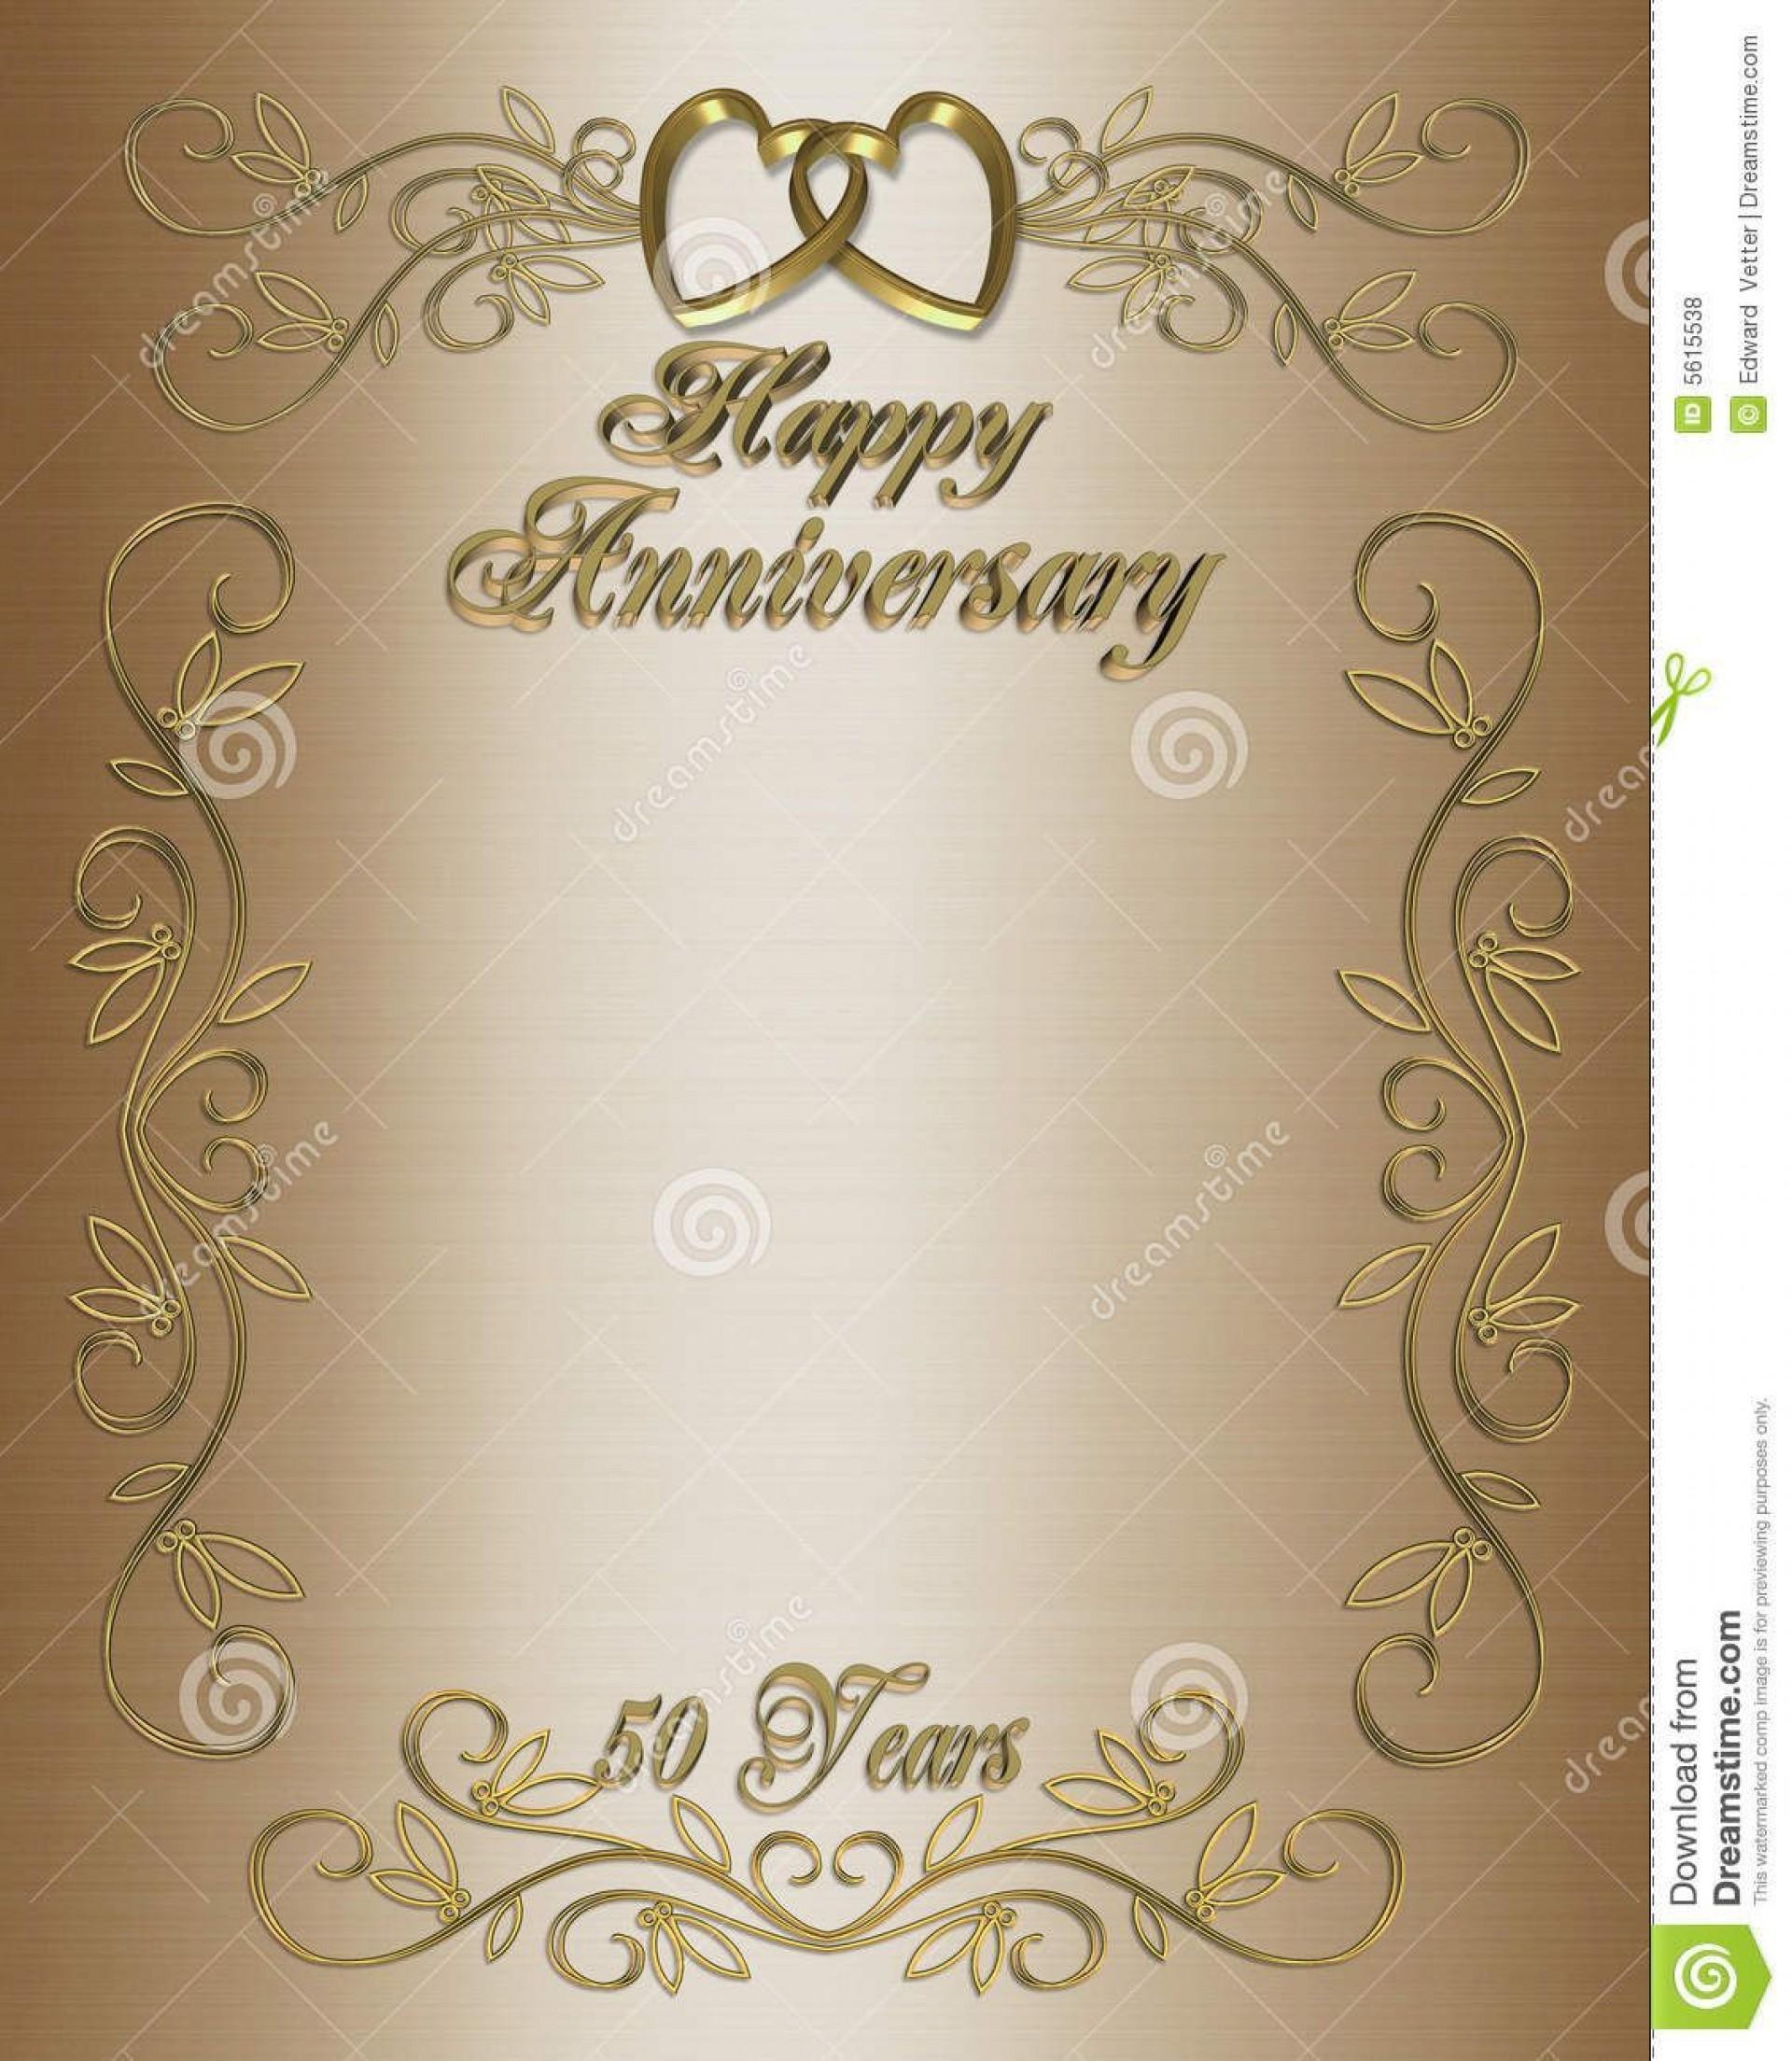 006 Wonderful Golden Wedding Anniversary Invitation Template Free High Def  50th Microsoft Word Download1920